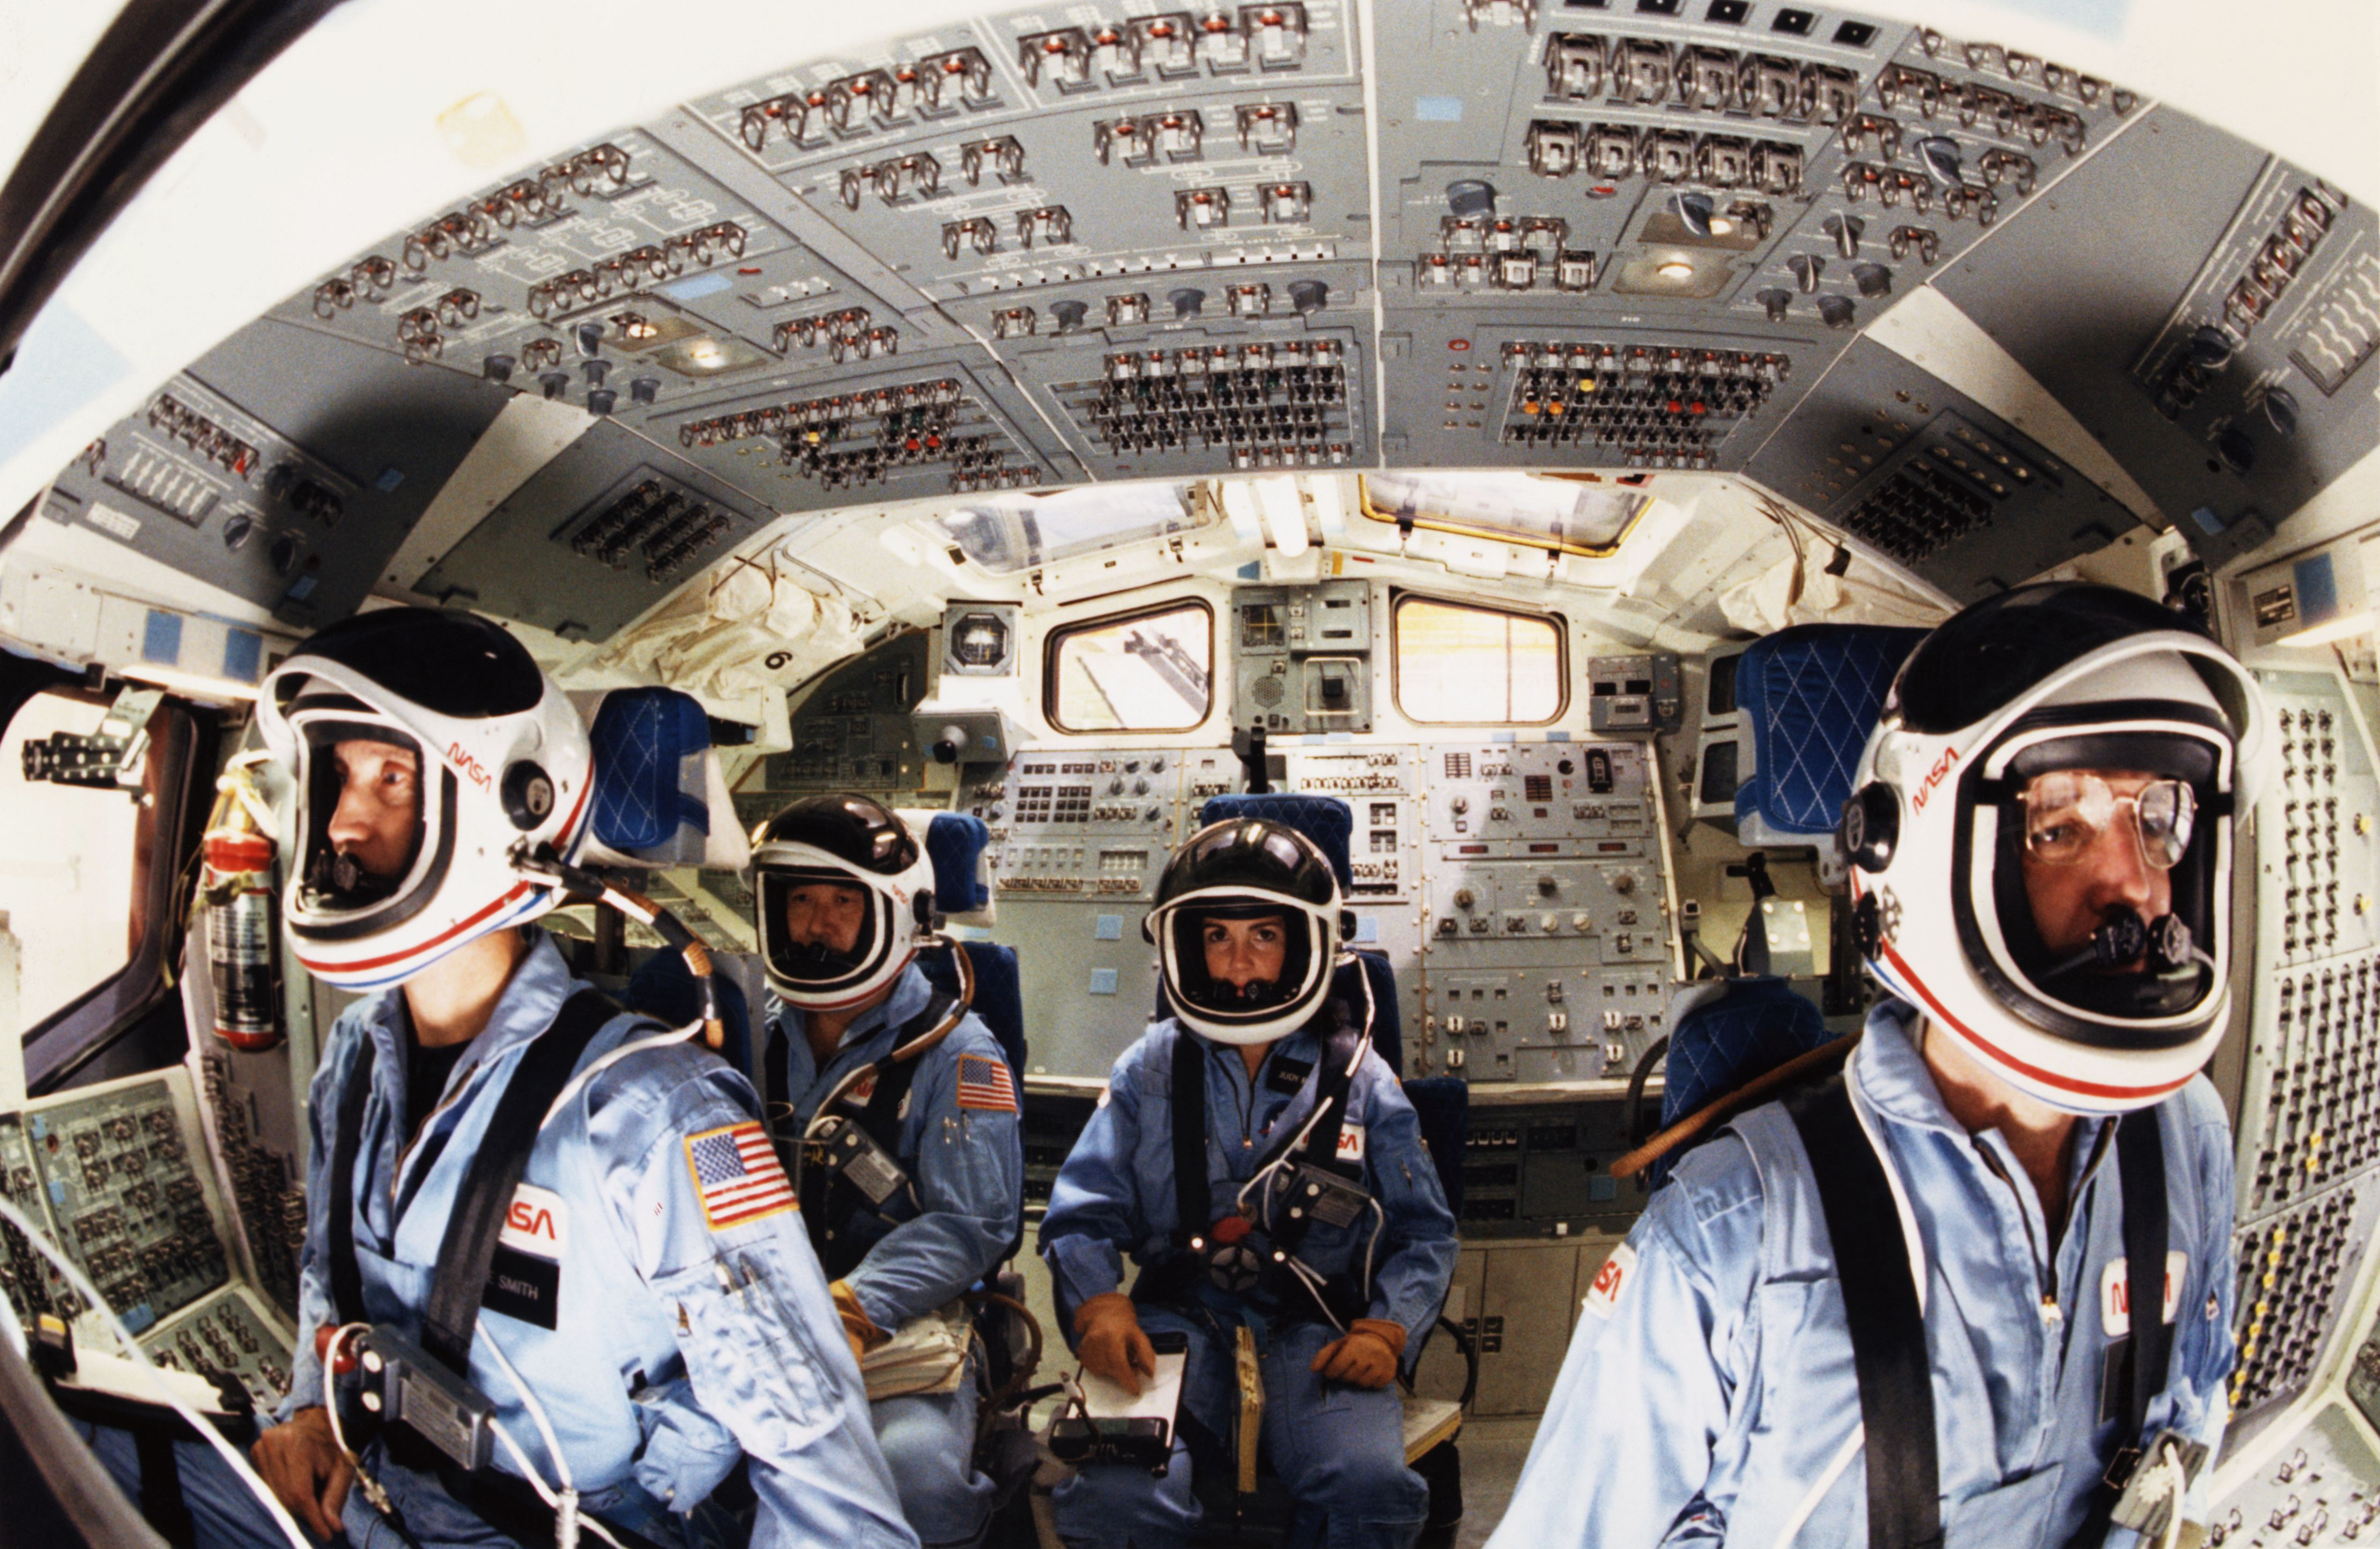 American Space Shuttle Astronauts Before Tragic Flight